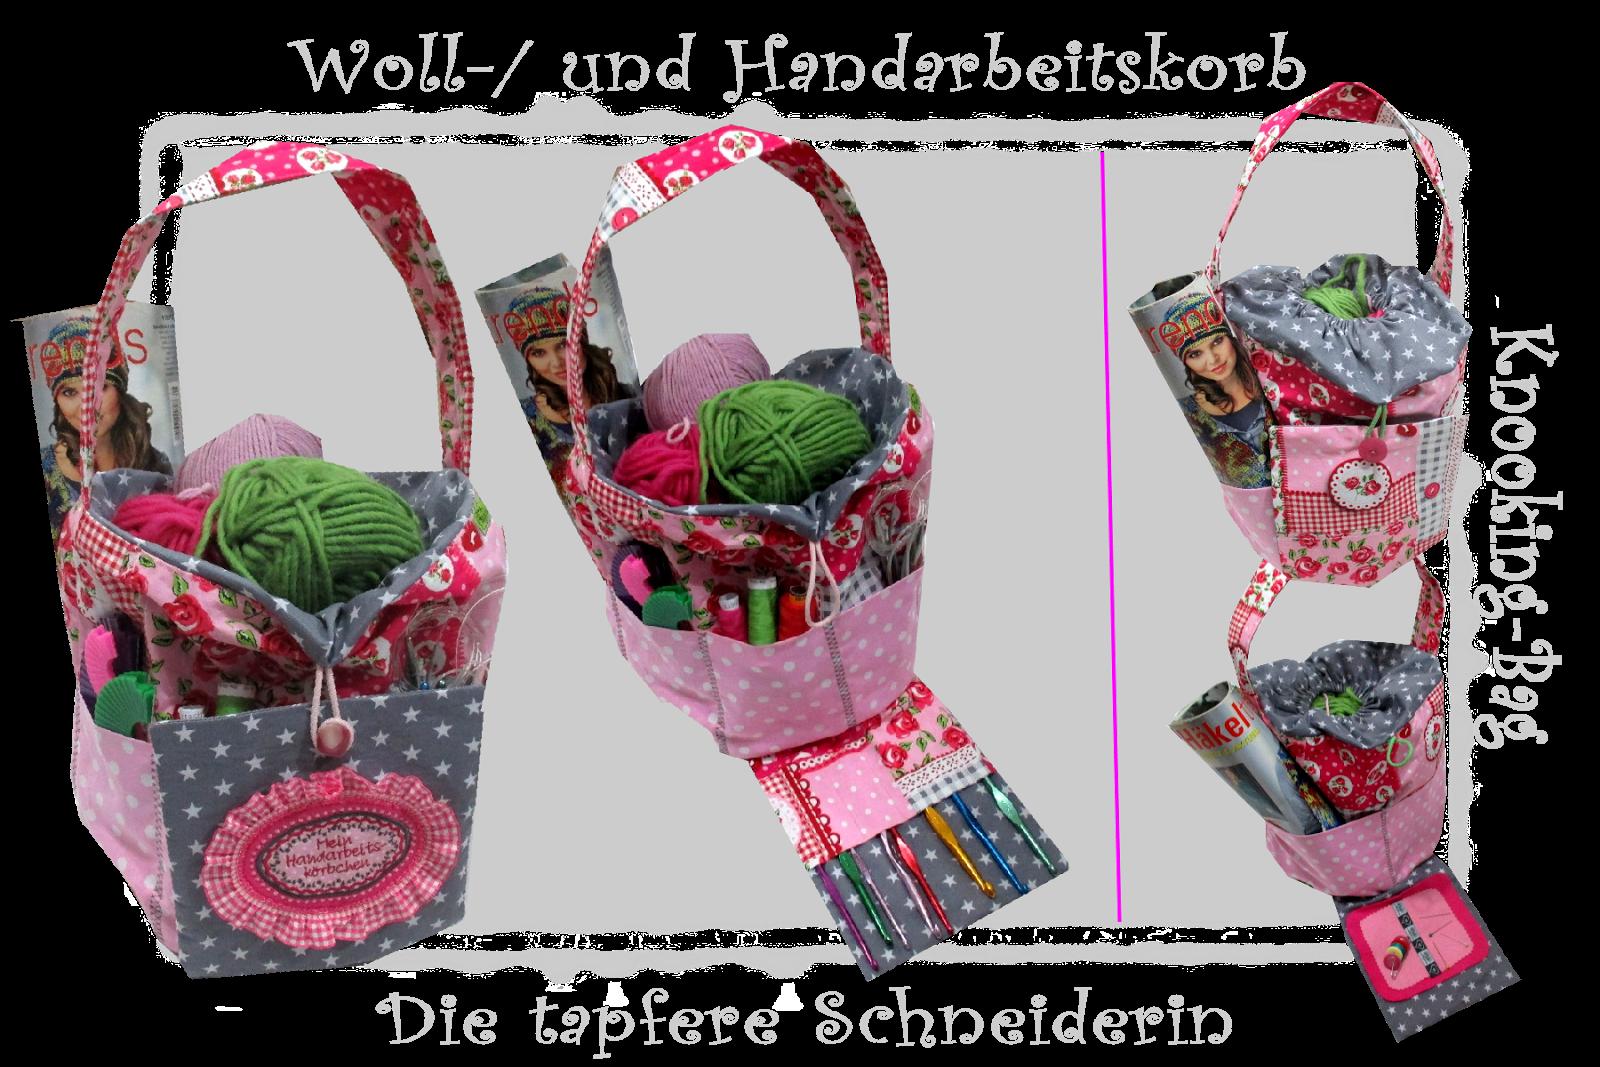 http://de.dawanda.com/product/69607303-Woll--Handarbeitskorb-Knooking-Bag